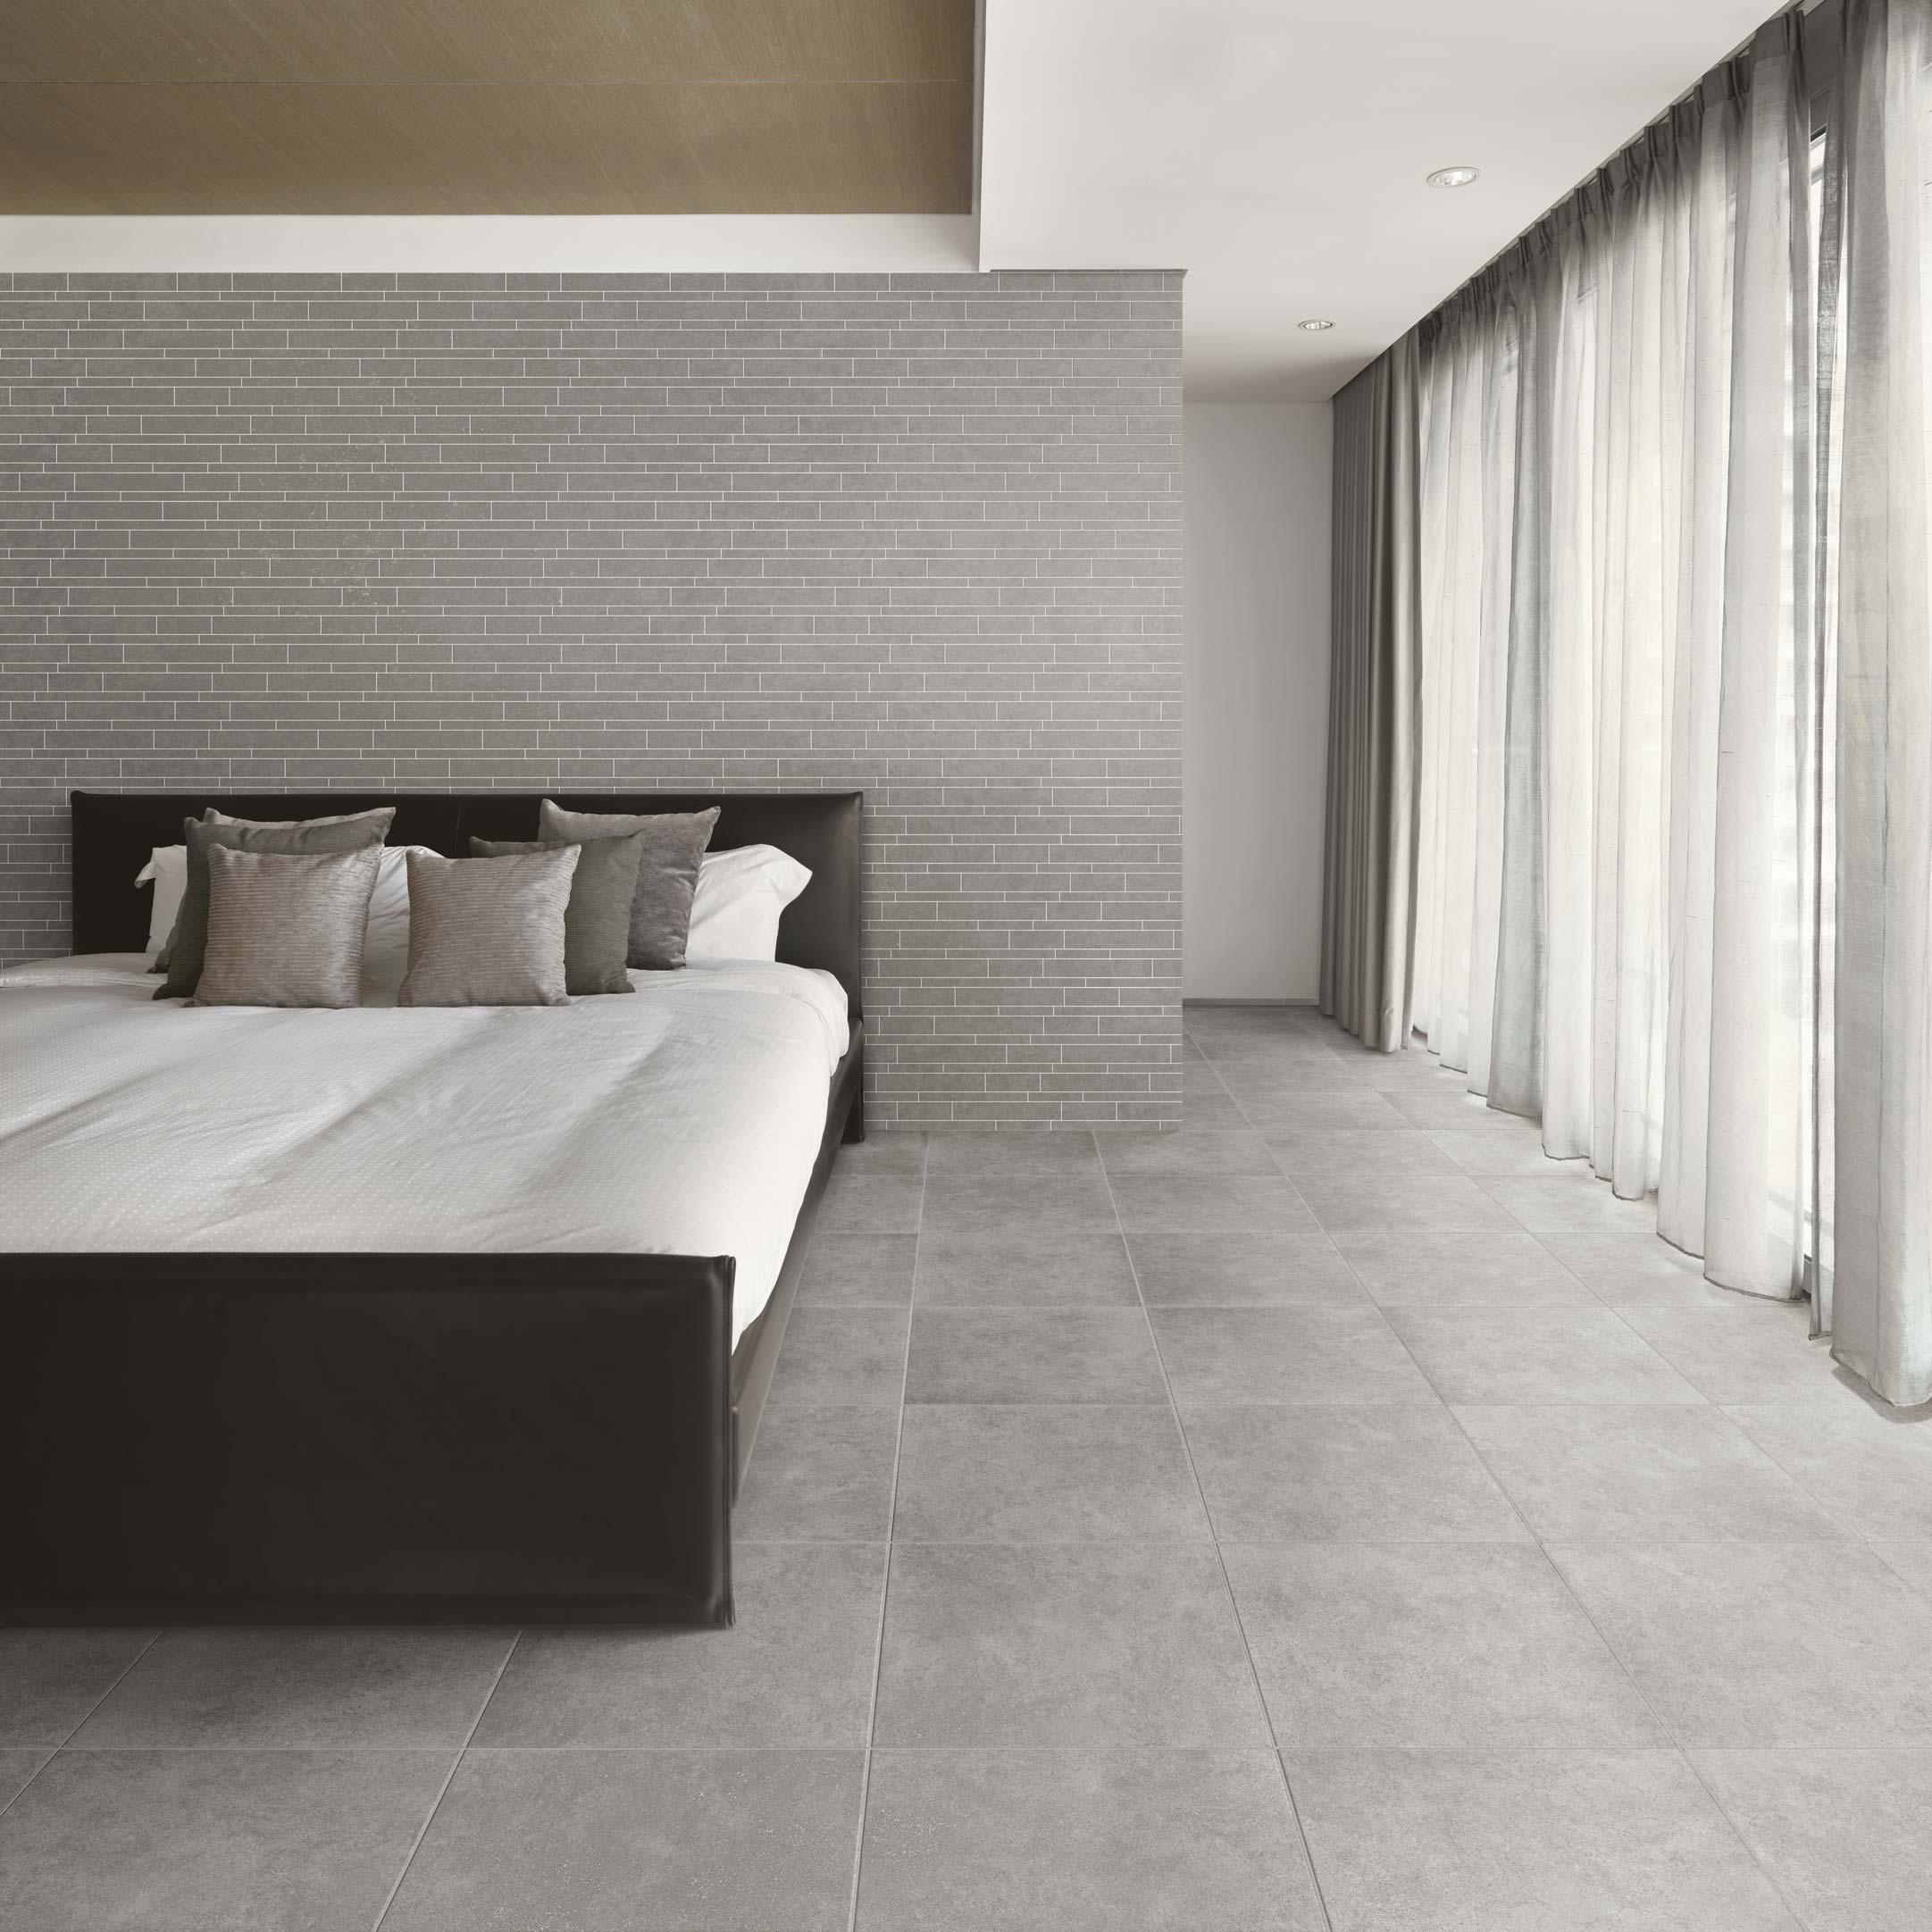 carrelage contemporain moderne et design la farl de 83210. Black Bedroom Furniture Sets. Home Design Ideas